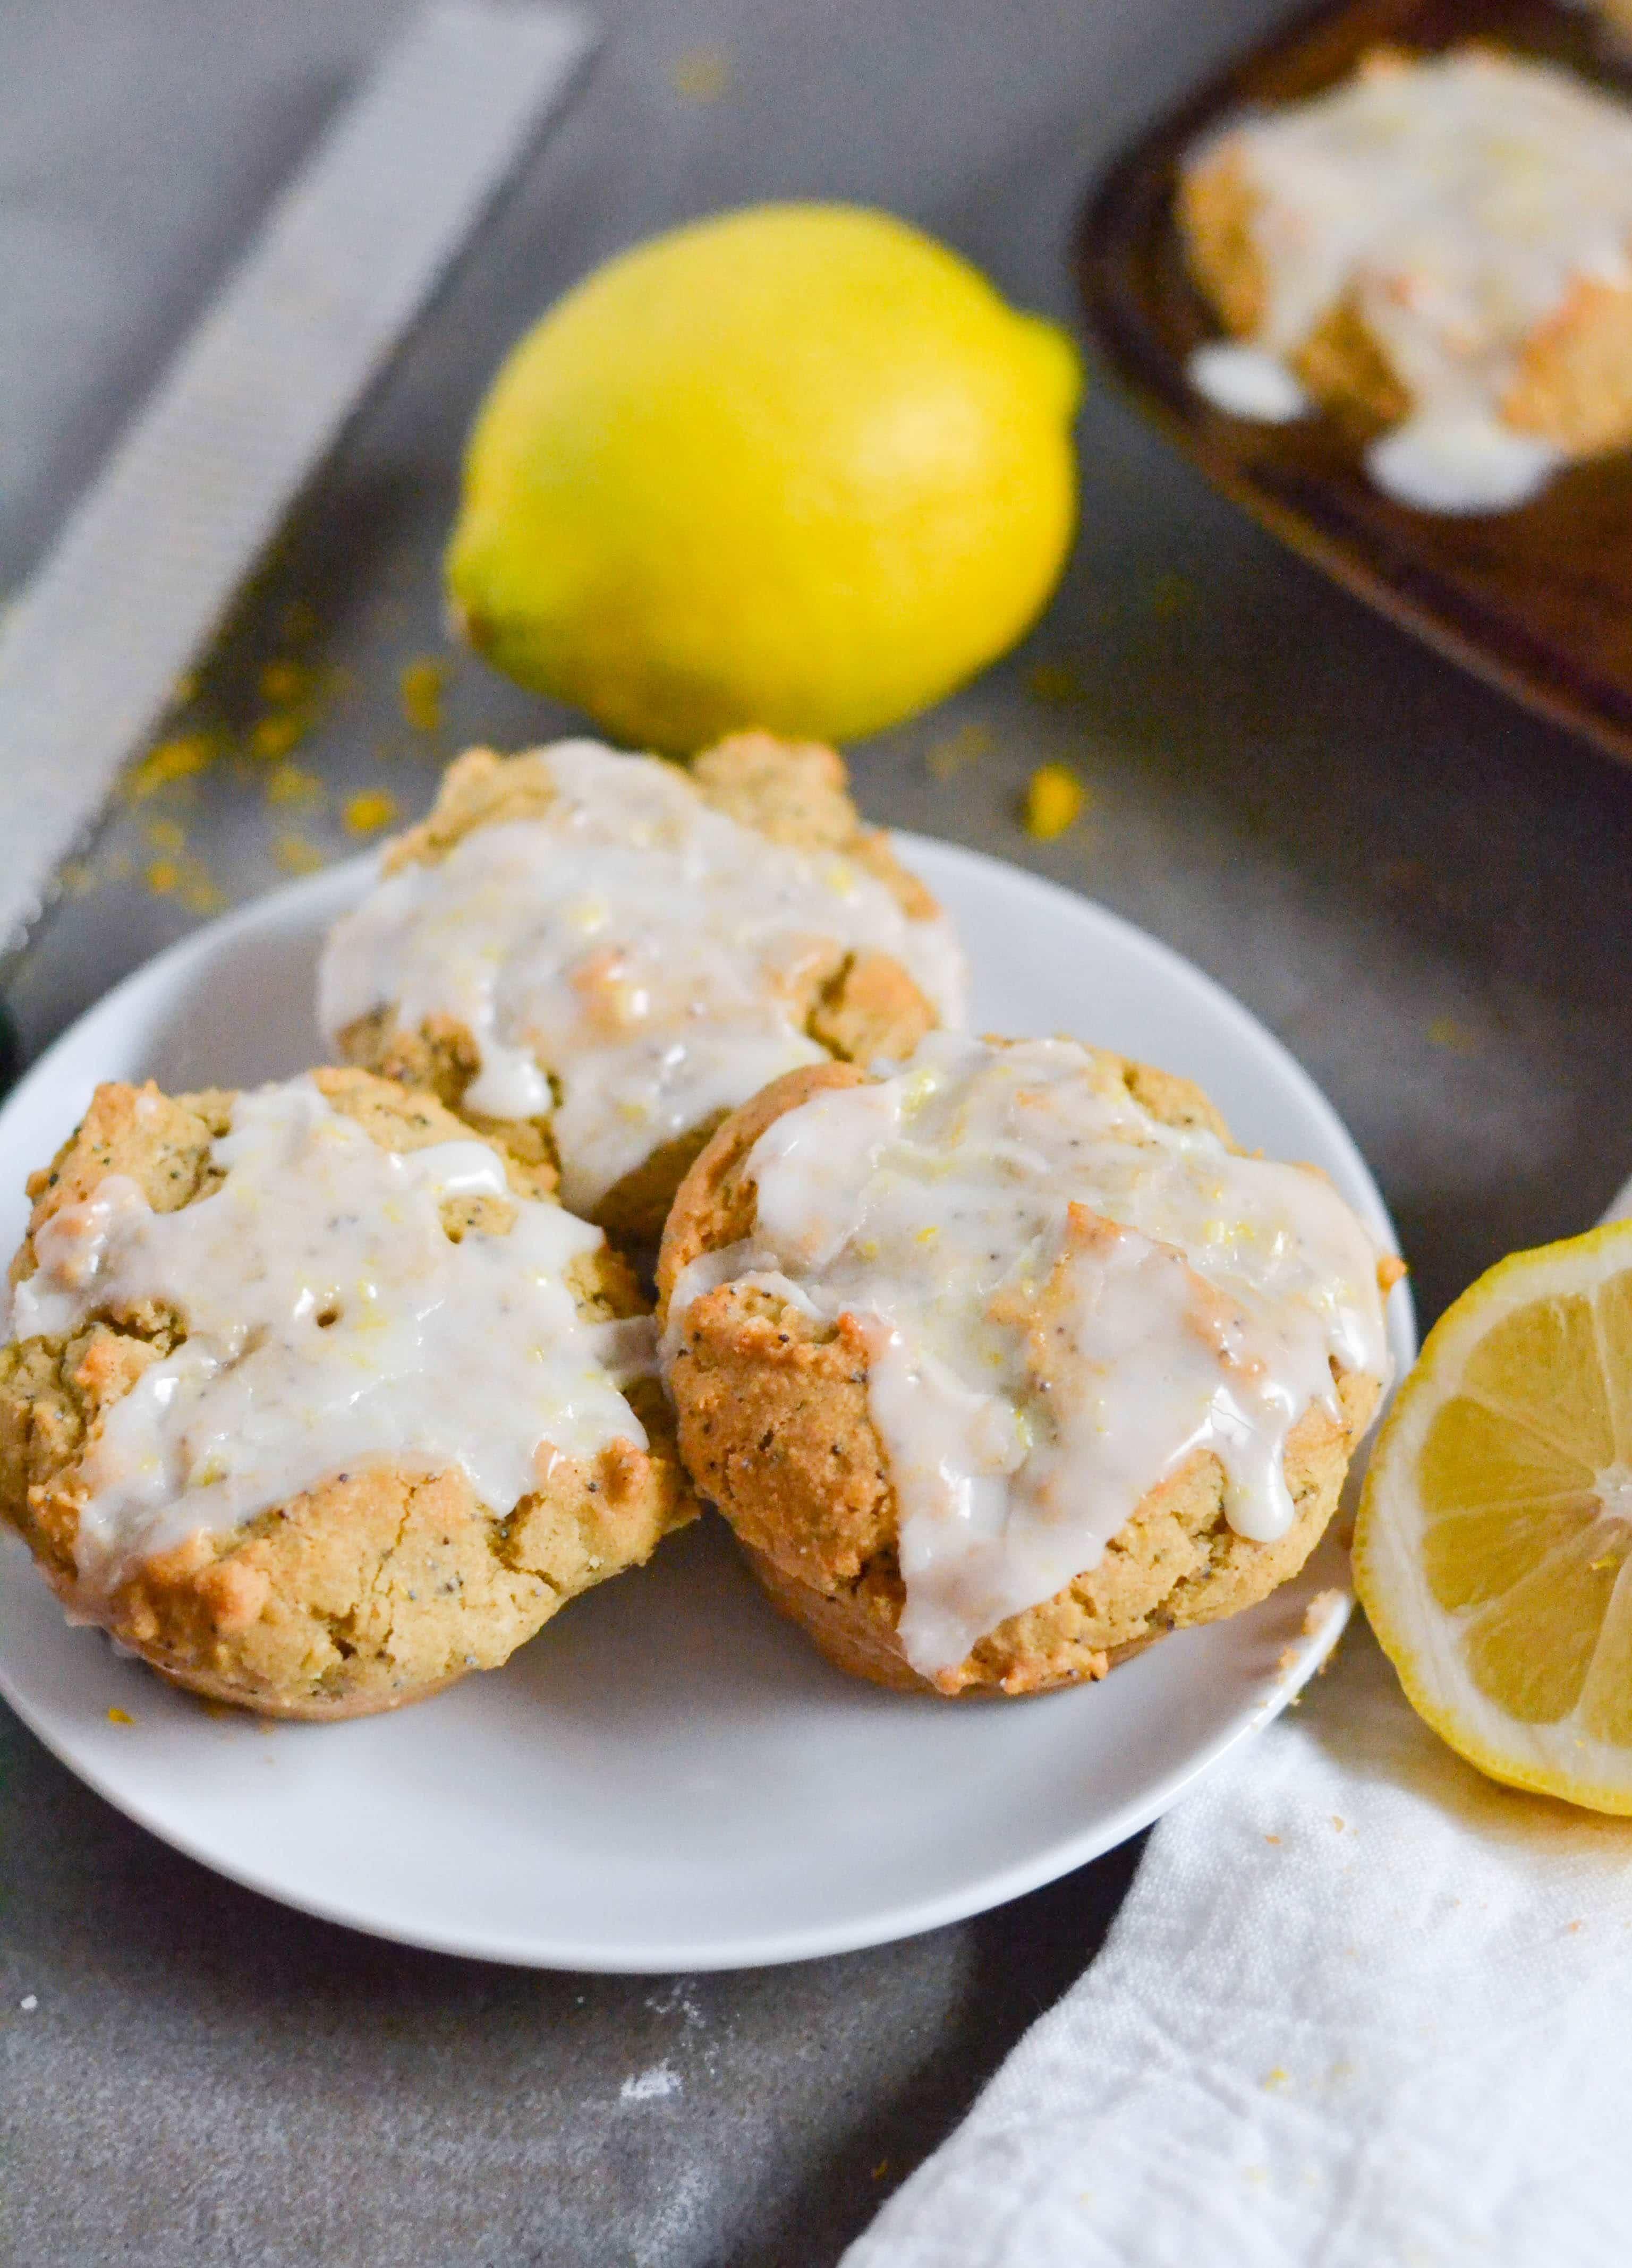 Gluten-Free Vegan Lemon Poppyseed Muffins (GF, DF, V) - A Dash of Megnut